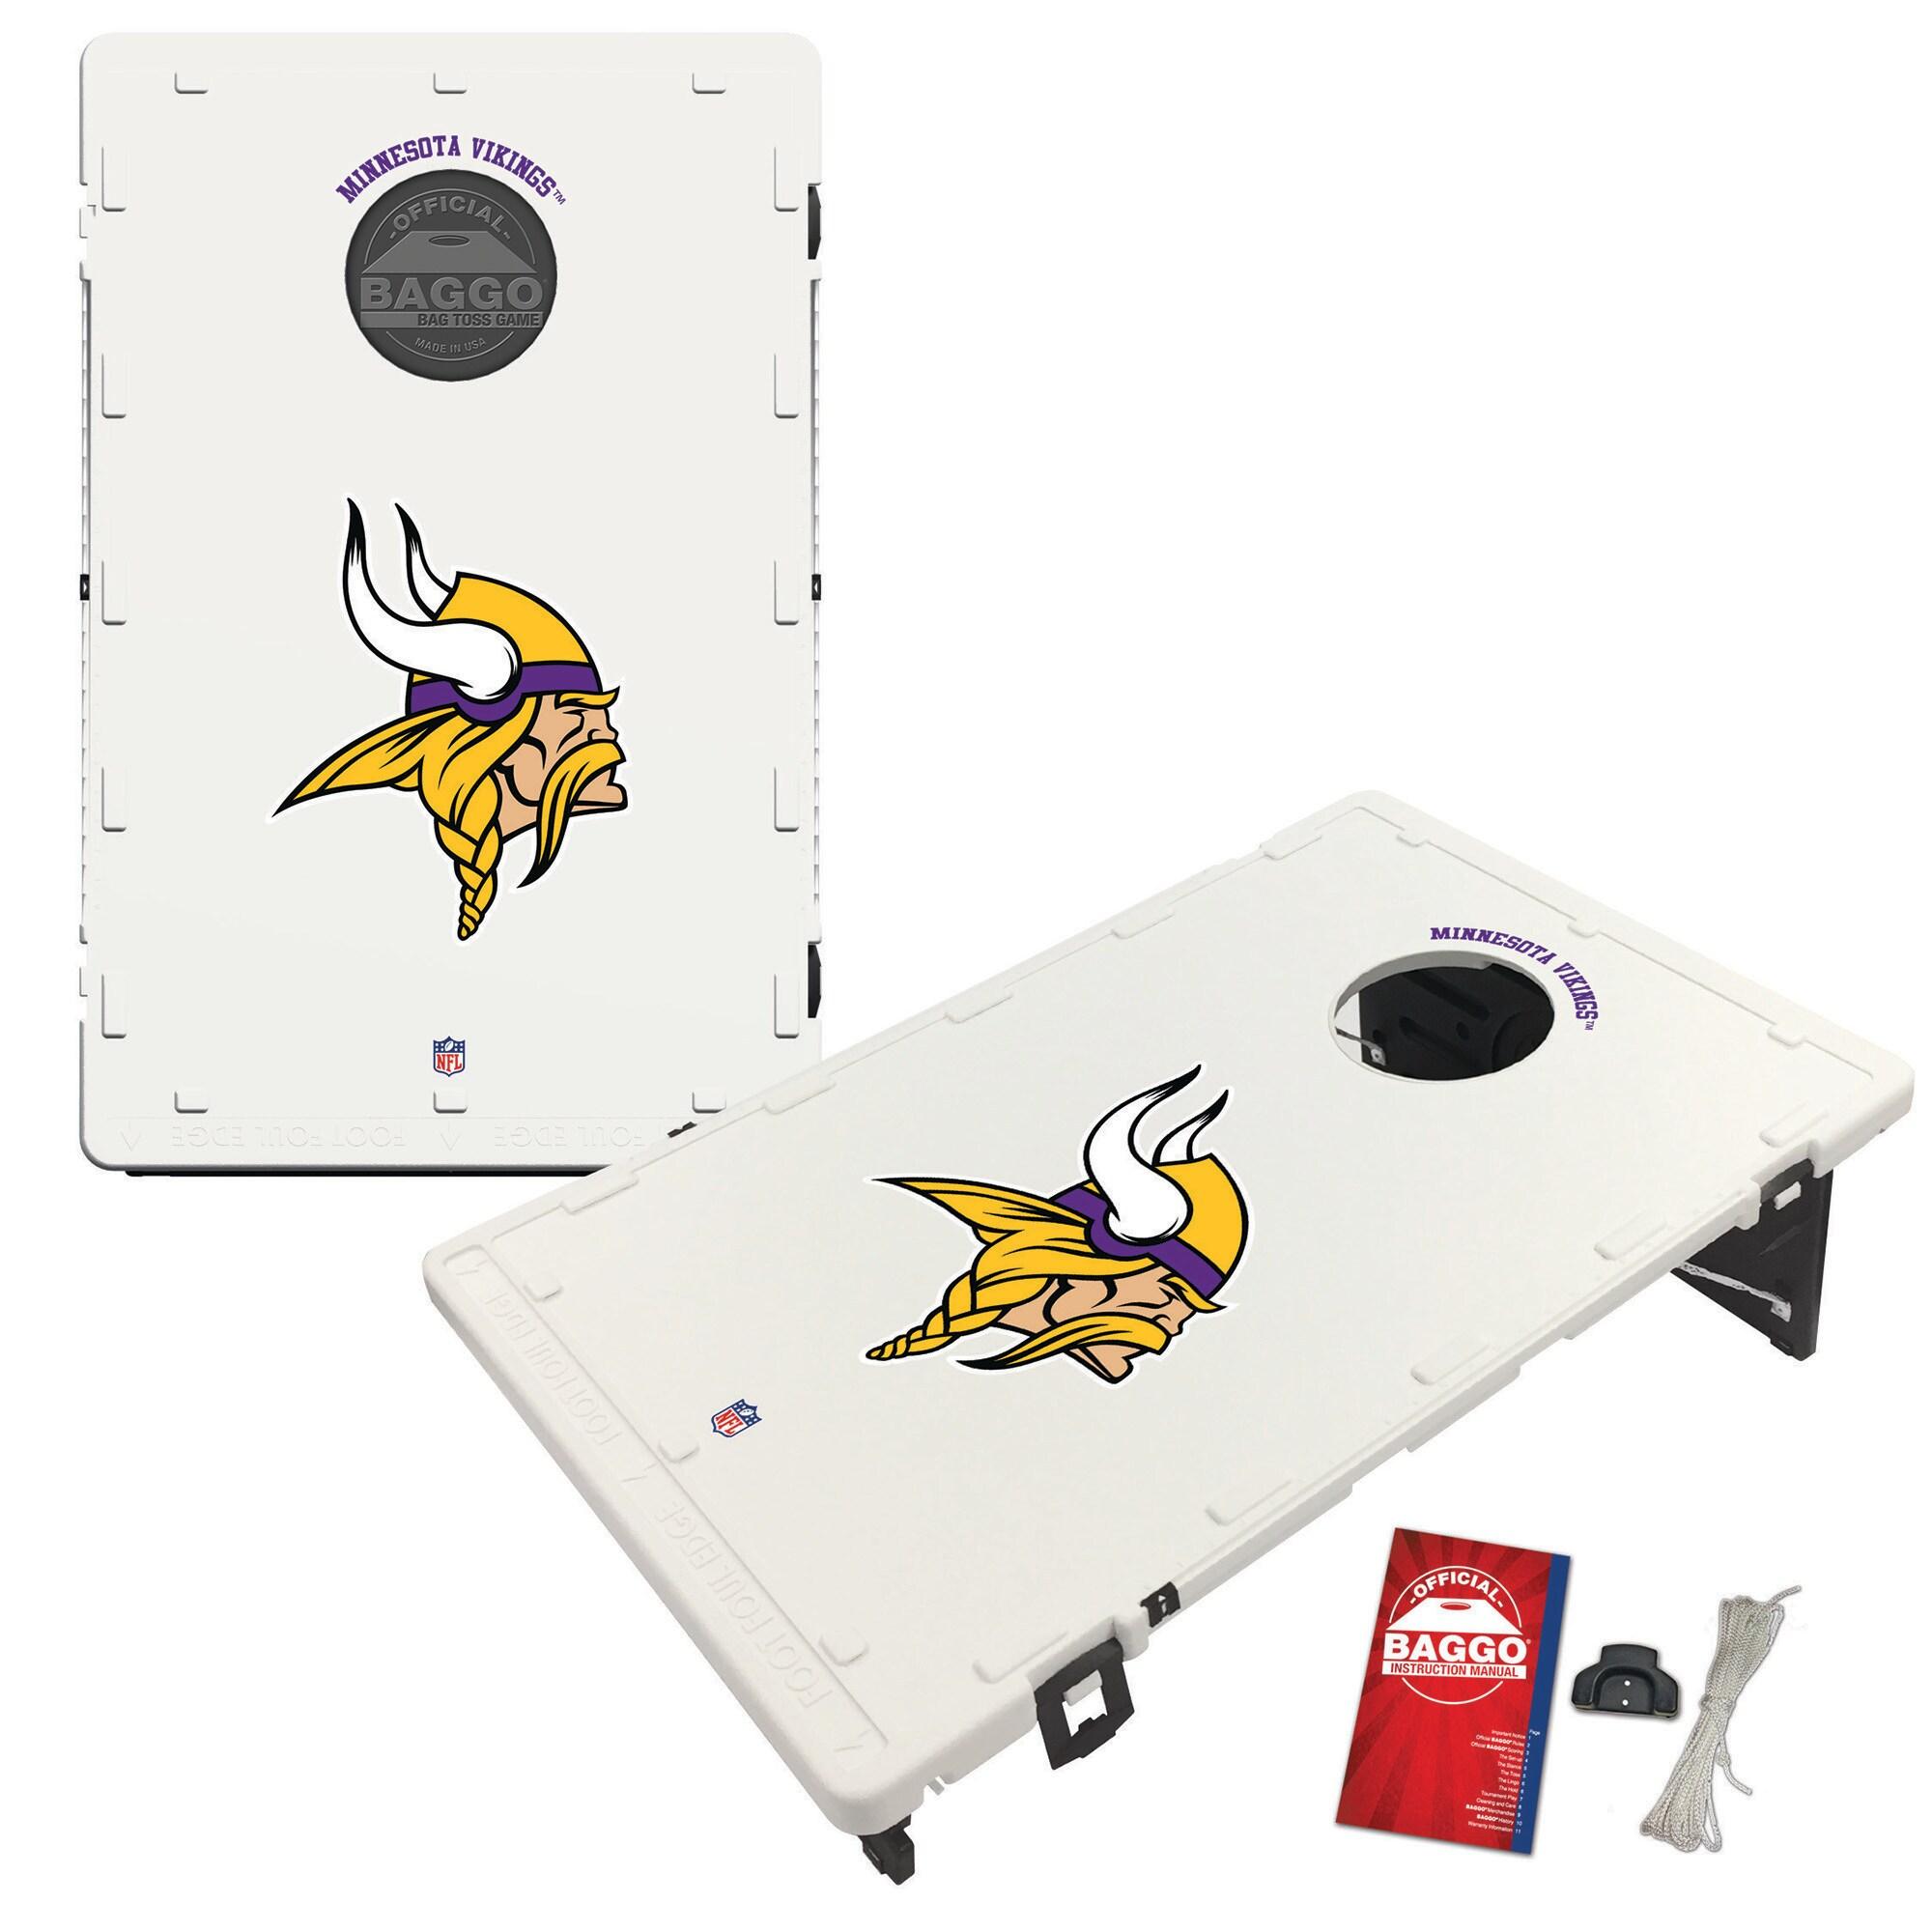 Minnesota Vikings 2' x 3' Classic Design BAGGO Cornhole Board Tailgate Toss Set